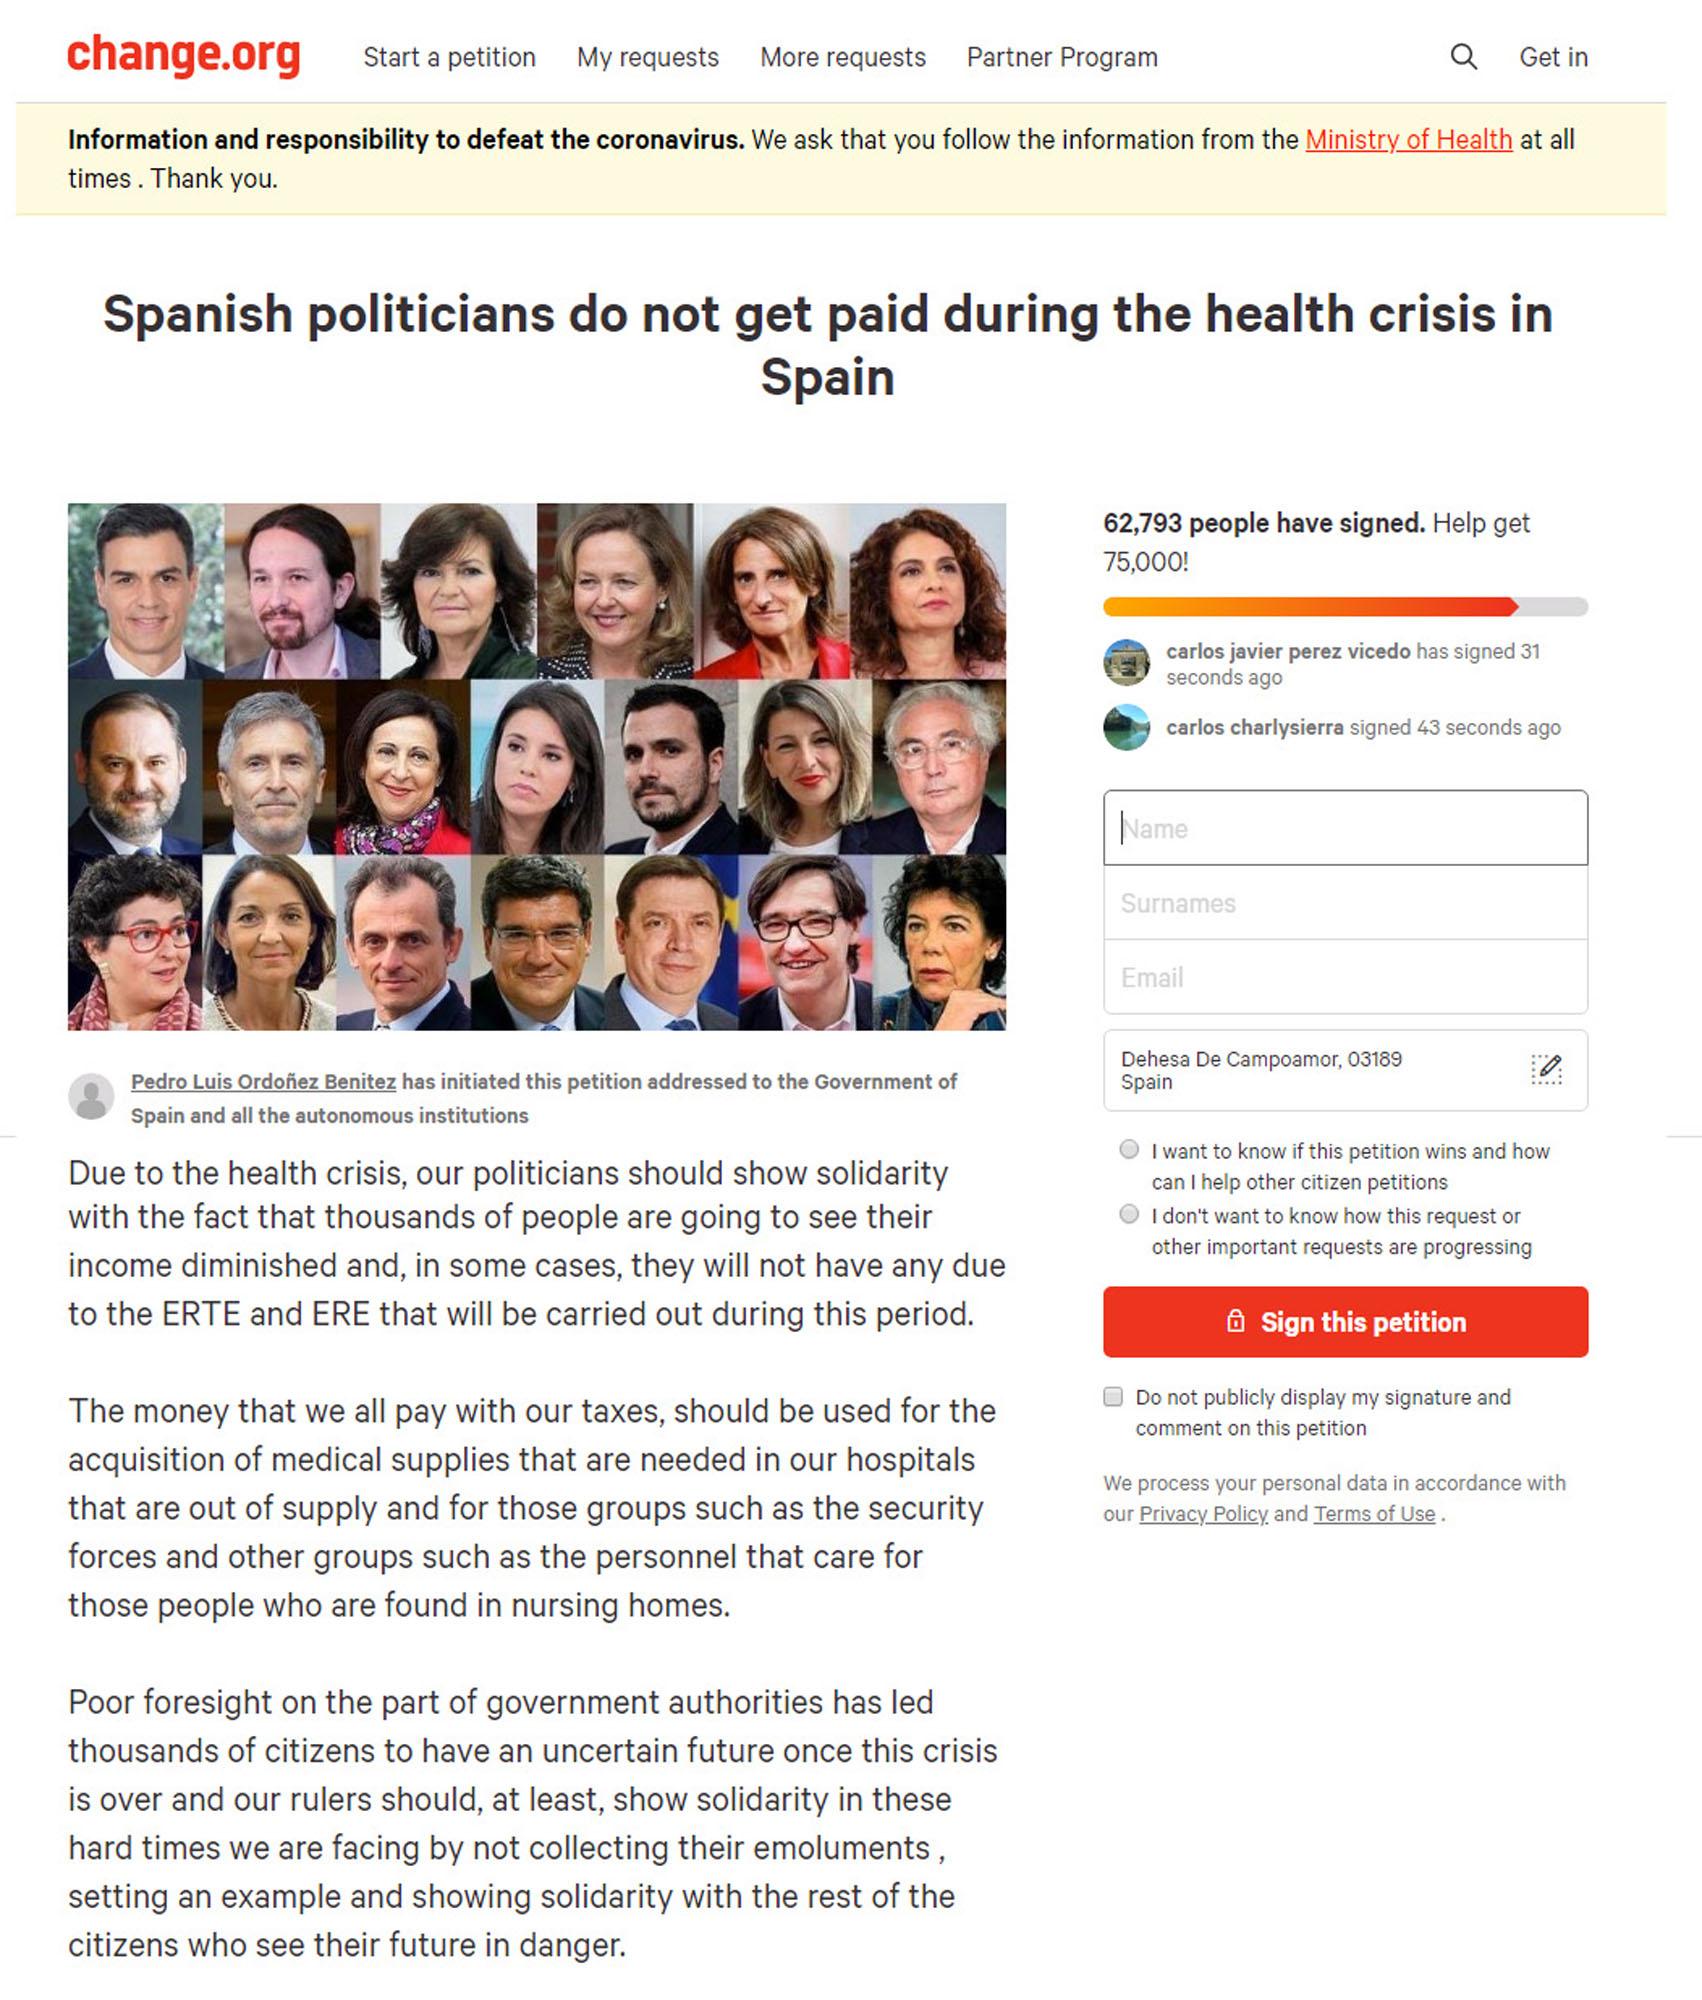 Petition demands that Spain Politicians relinquish salaries during crisis